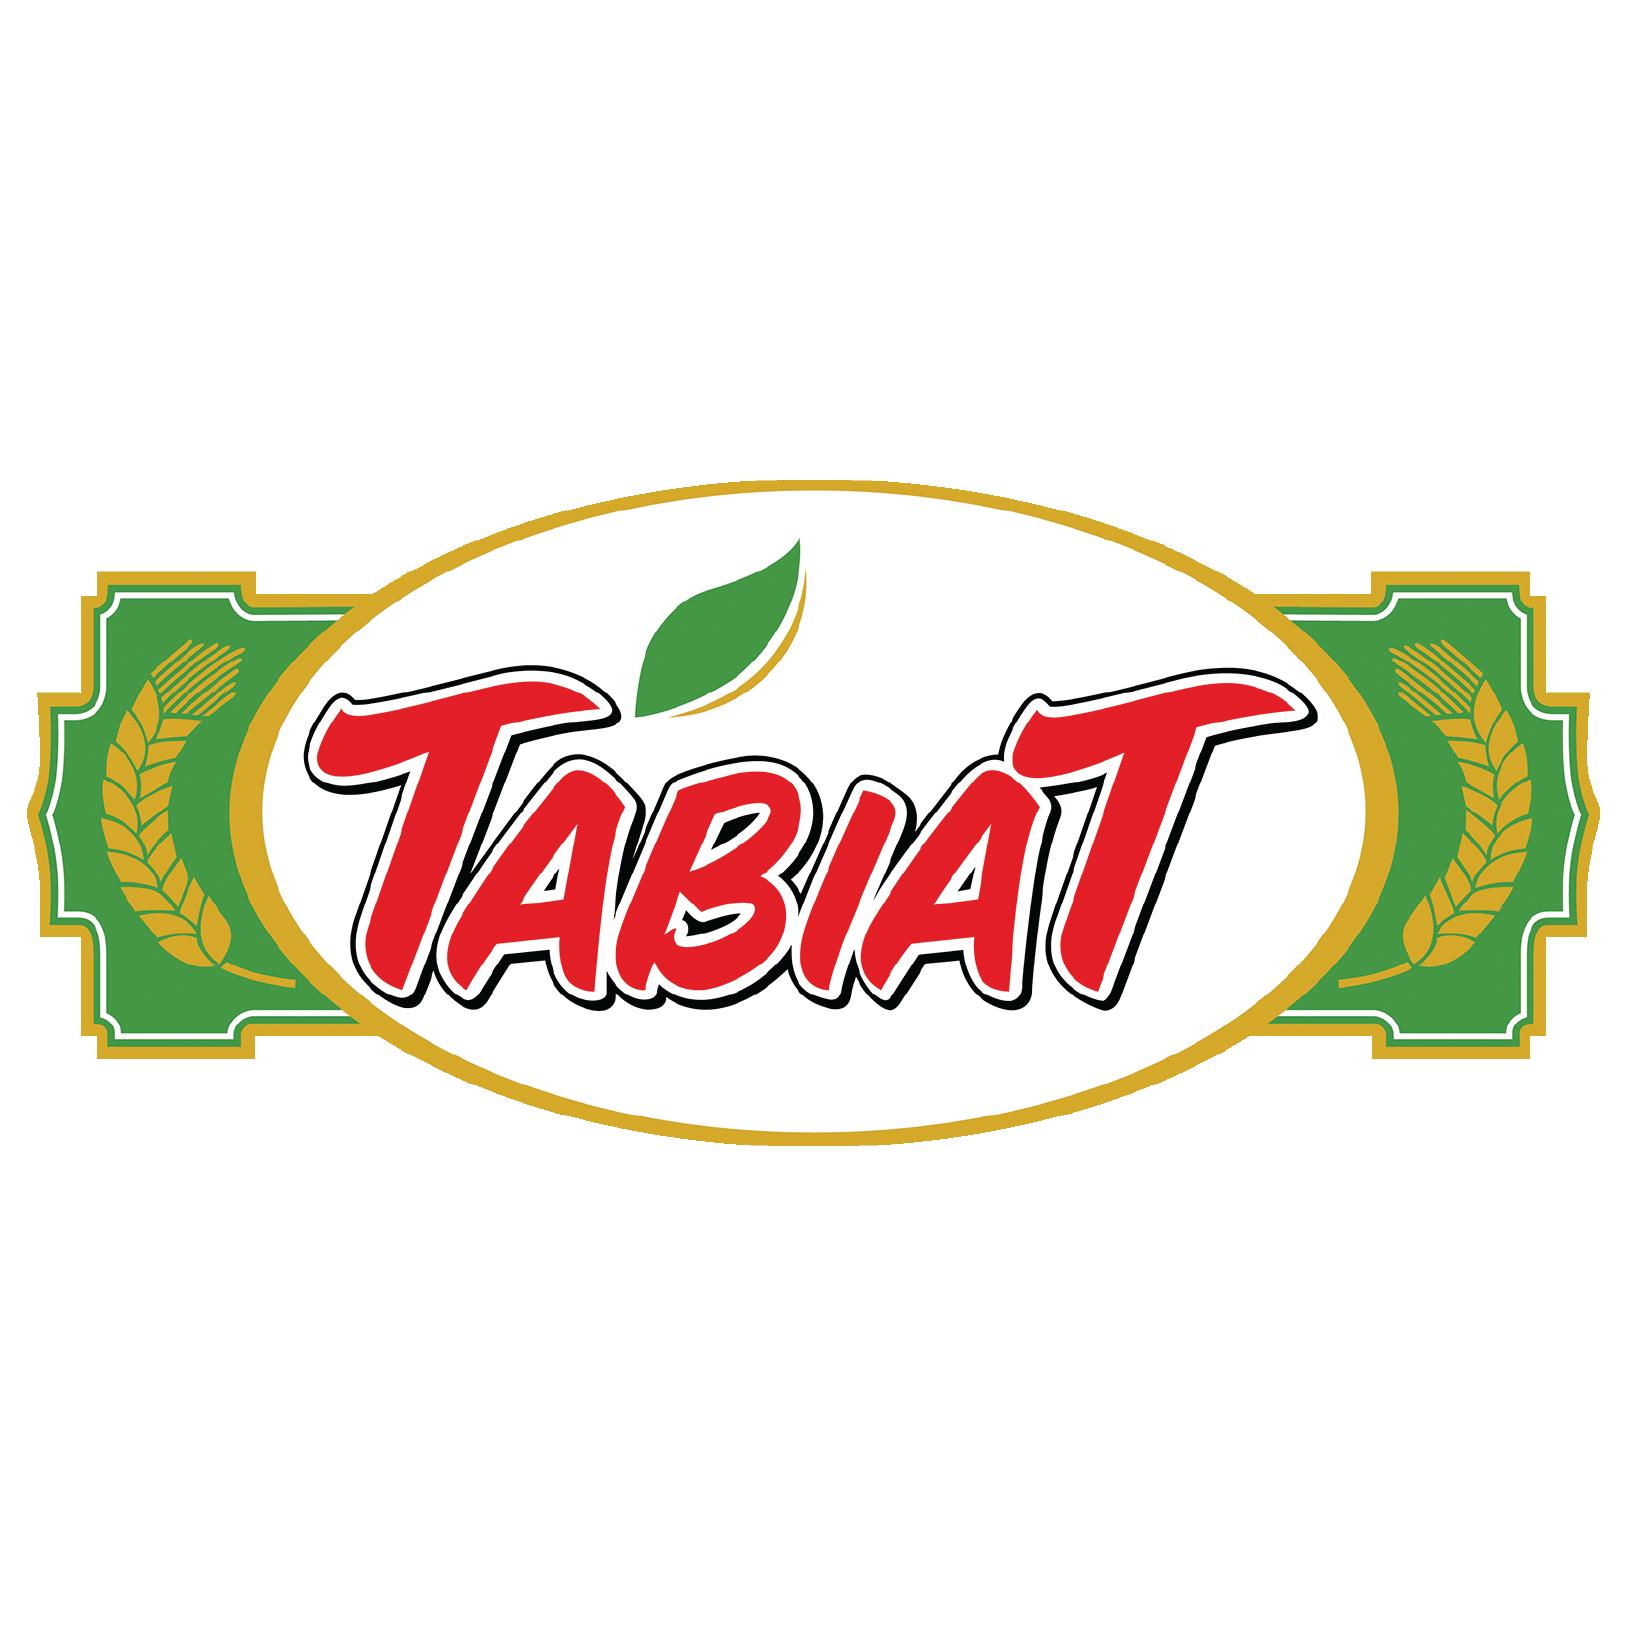 Tabeat